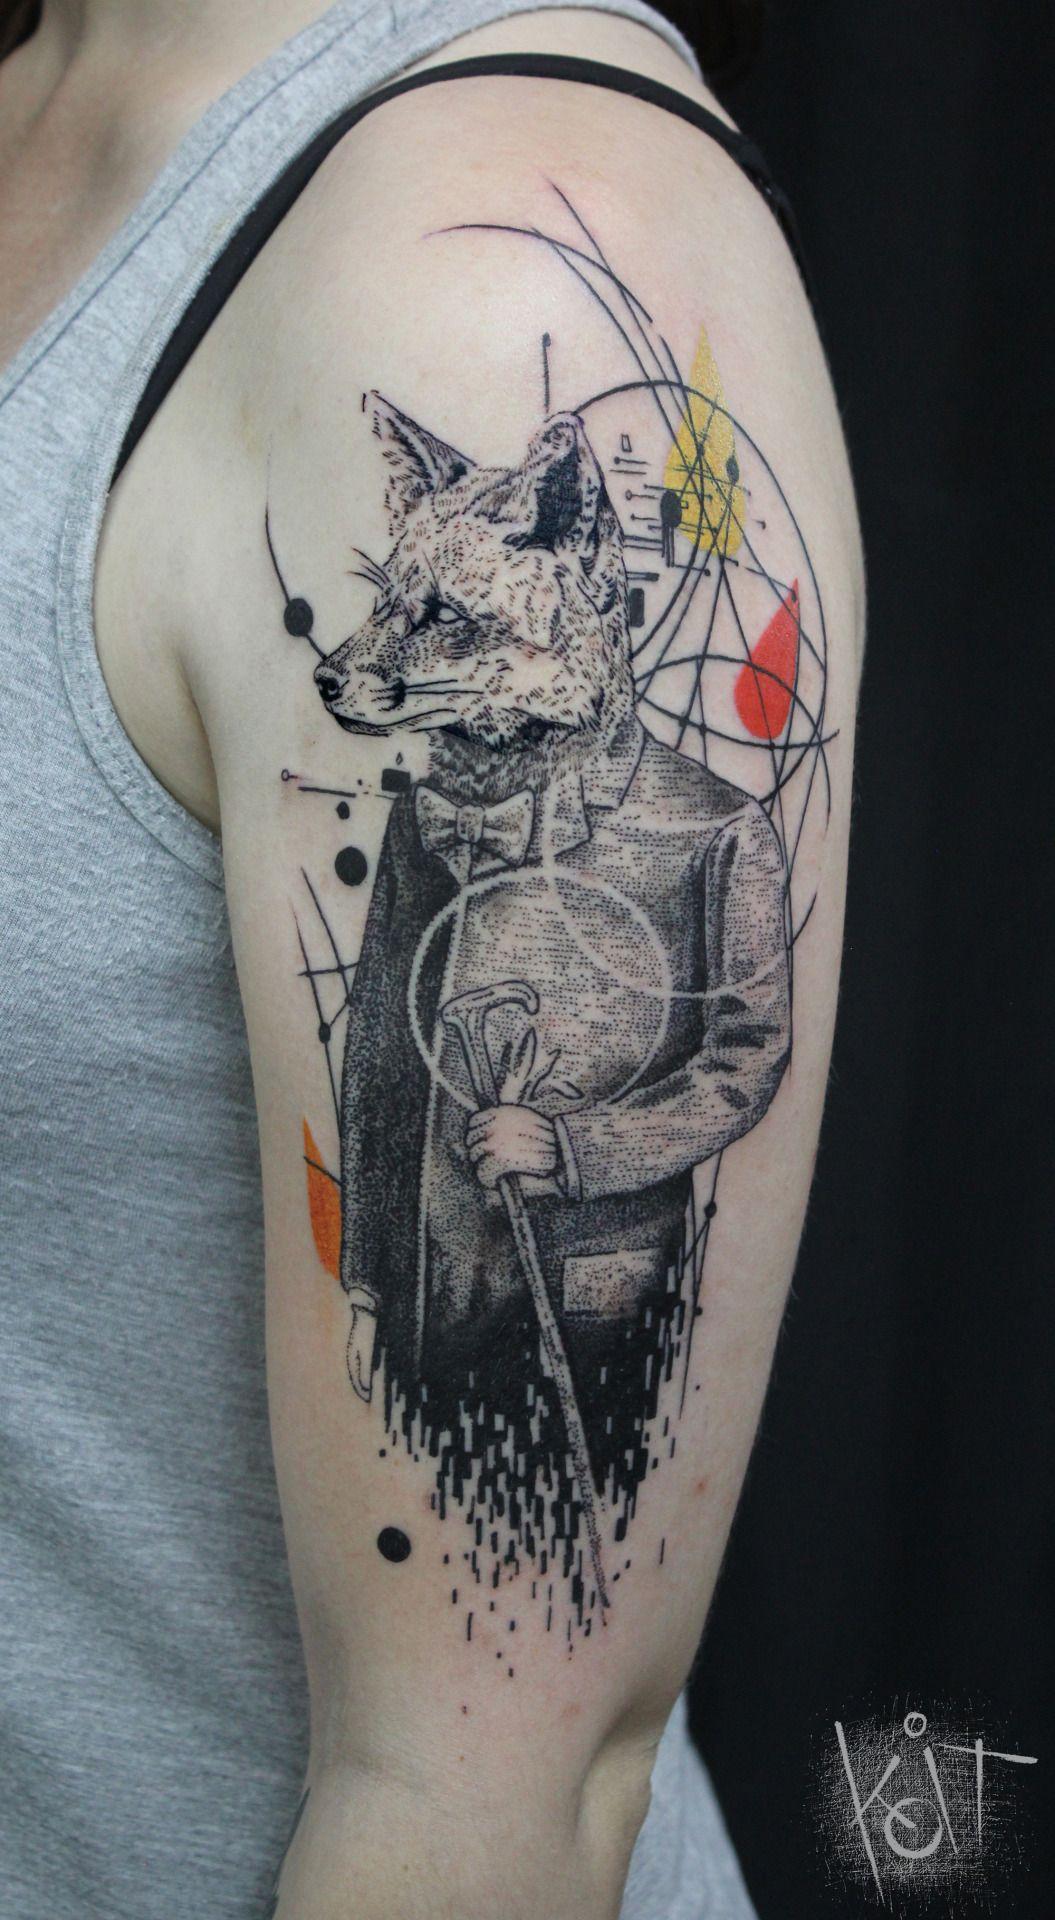 koit tattoo berlin fox tattoo graphic style inked arm photoshop style tattoo tattoo. Black Bedroom Furniture Sets. Home Design Ideas